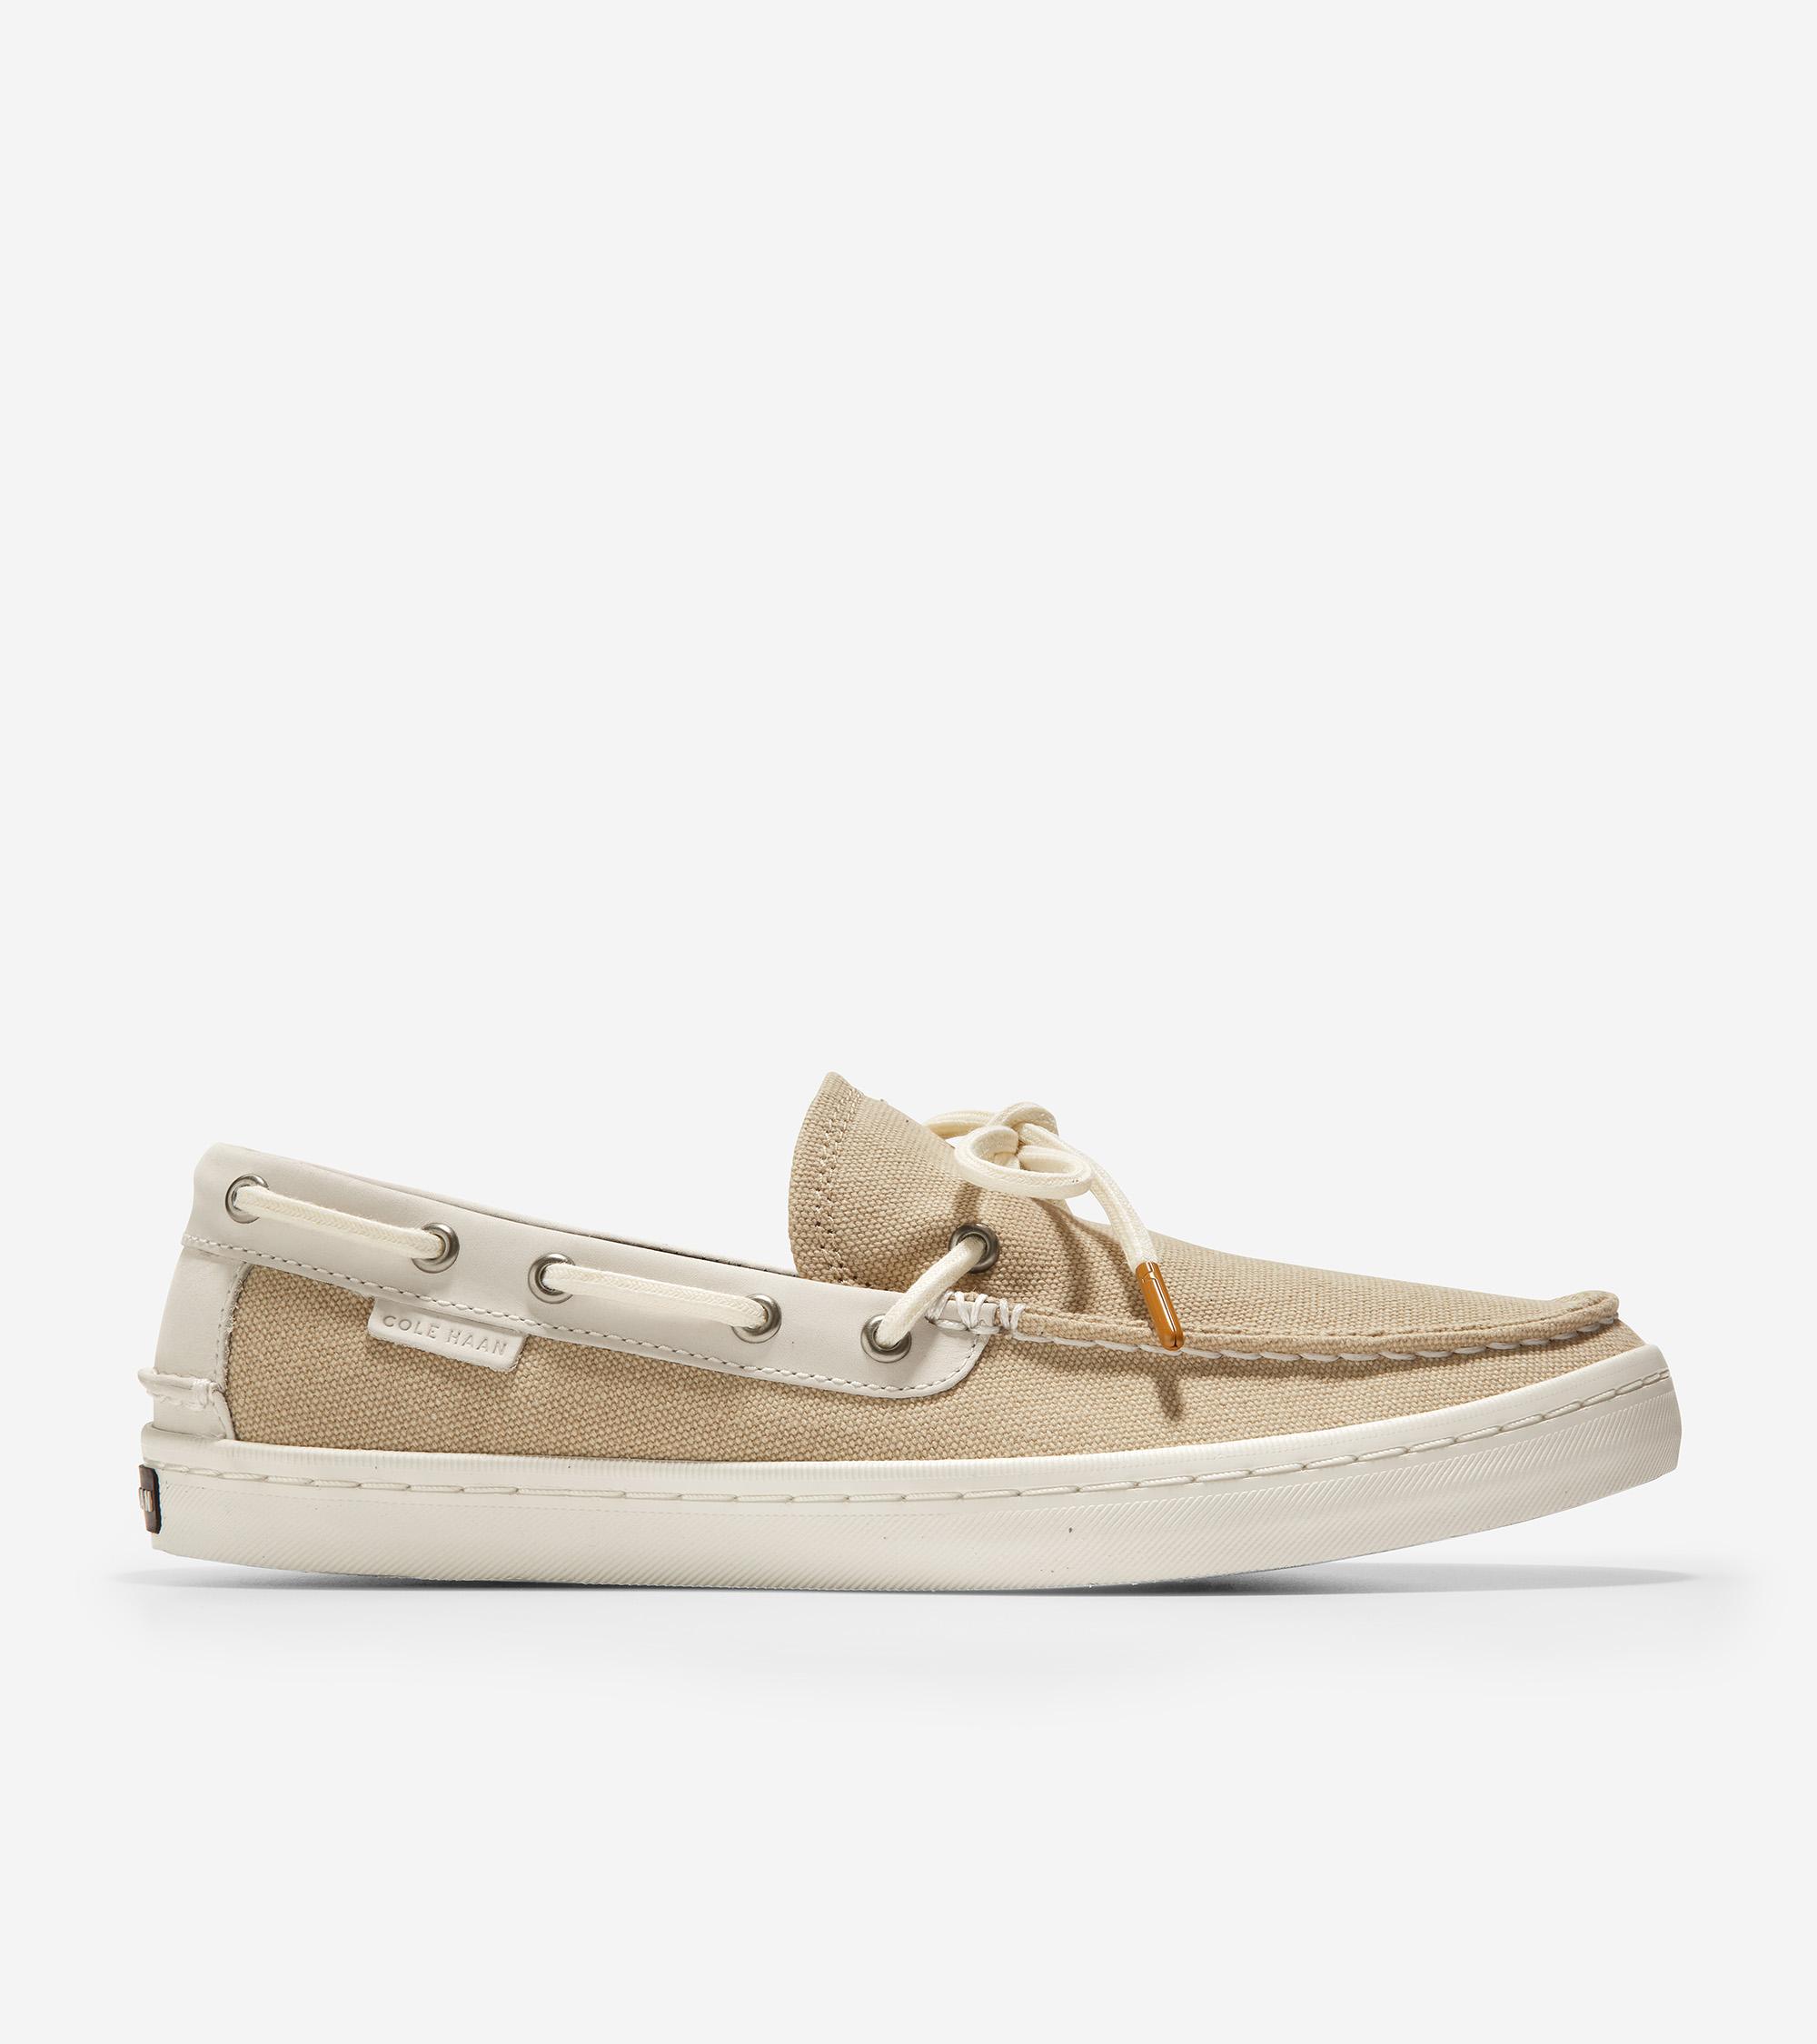 Cole Haan Men's Pinch Weekender Camp Moc Loafer, best boat shoes